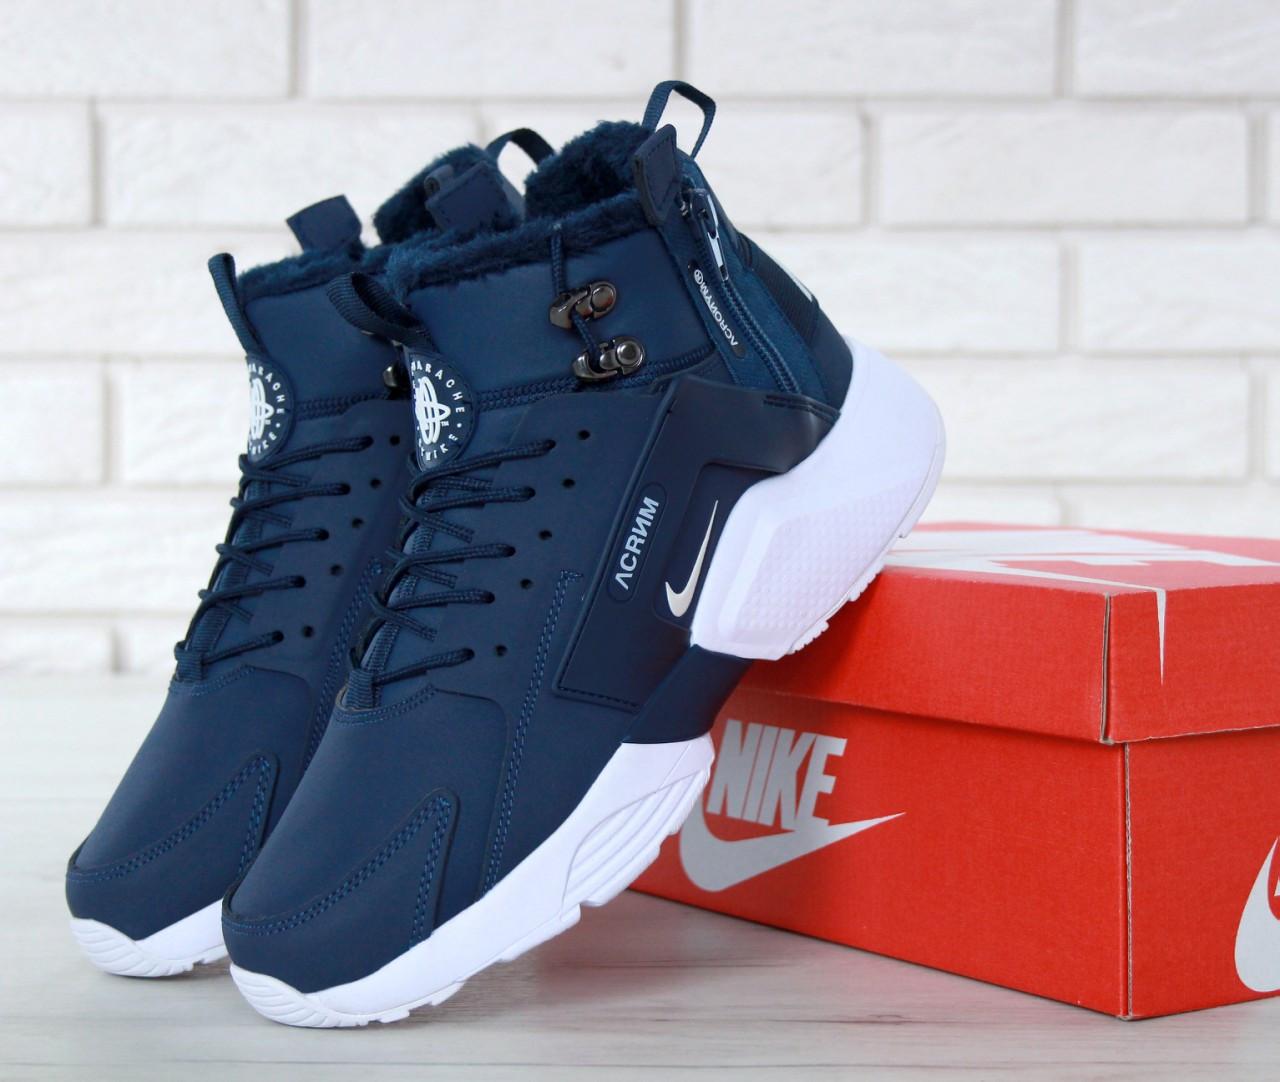 Кроссовки на меху Nike Huarache X Acronym City Winter Navy Blue